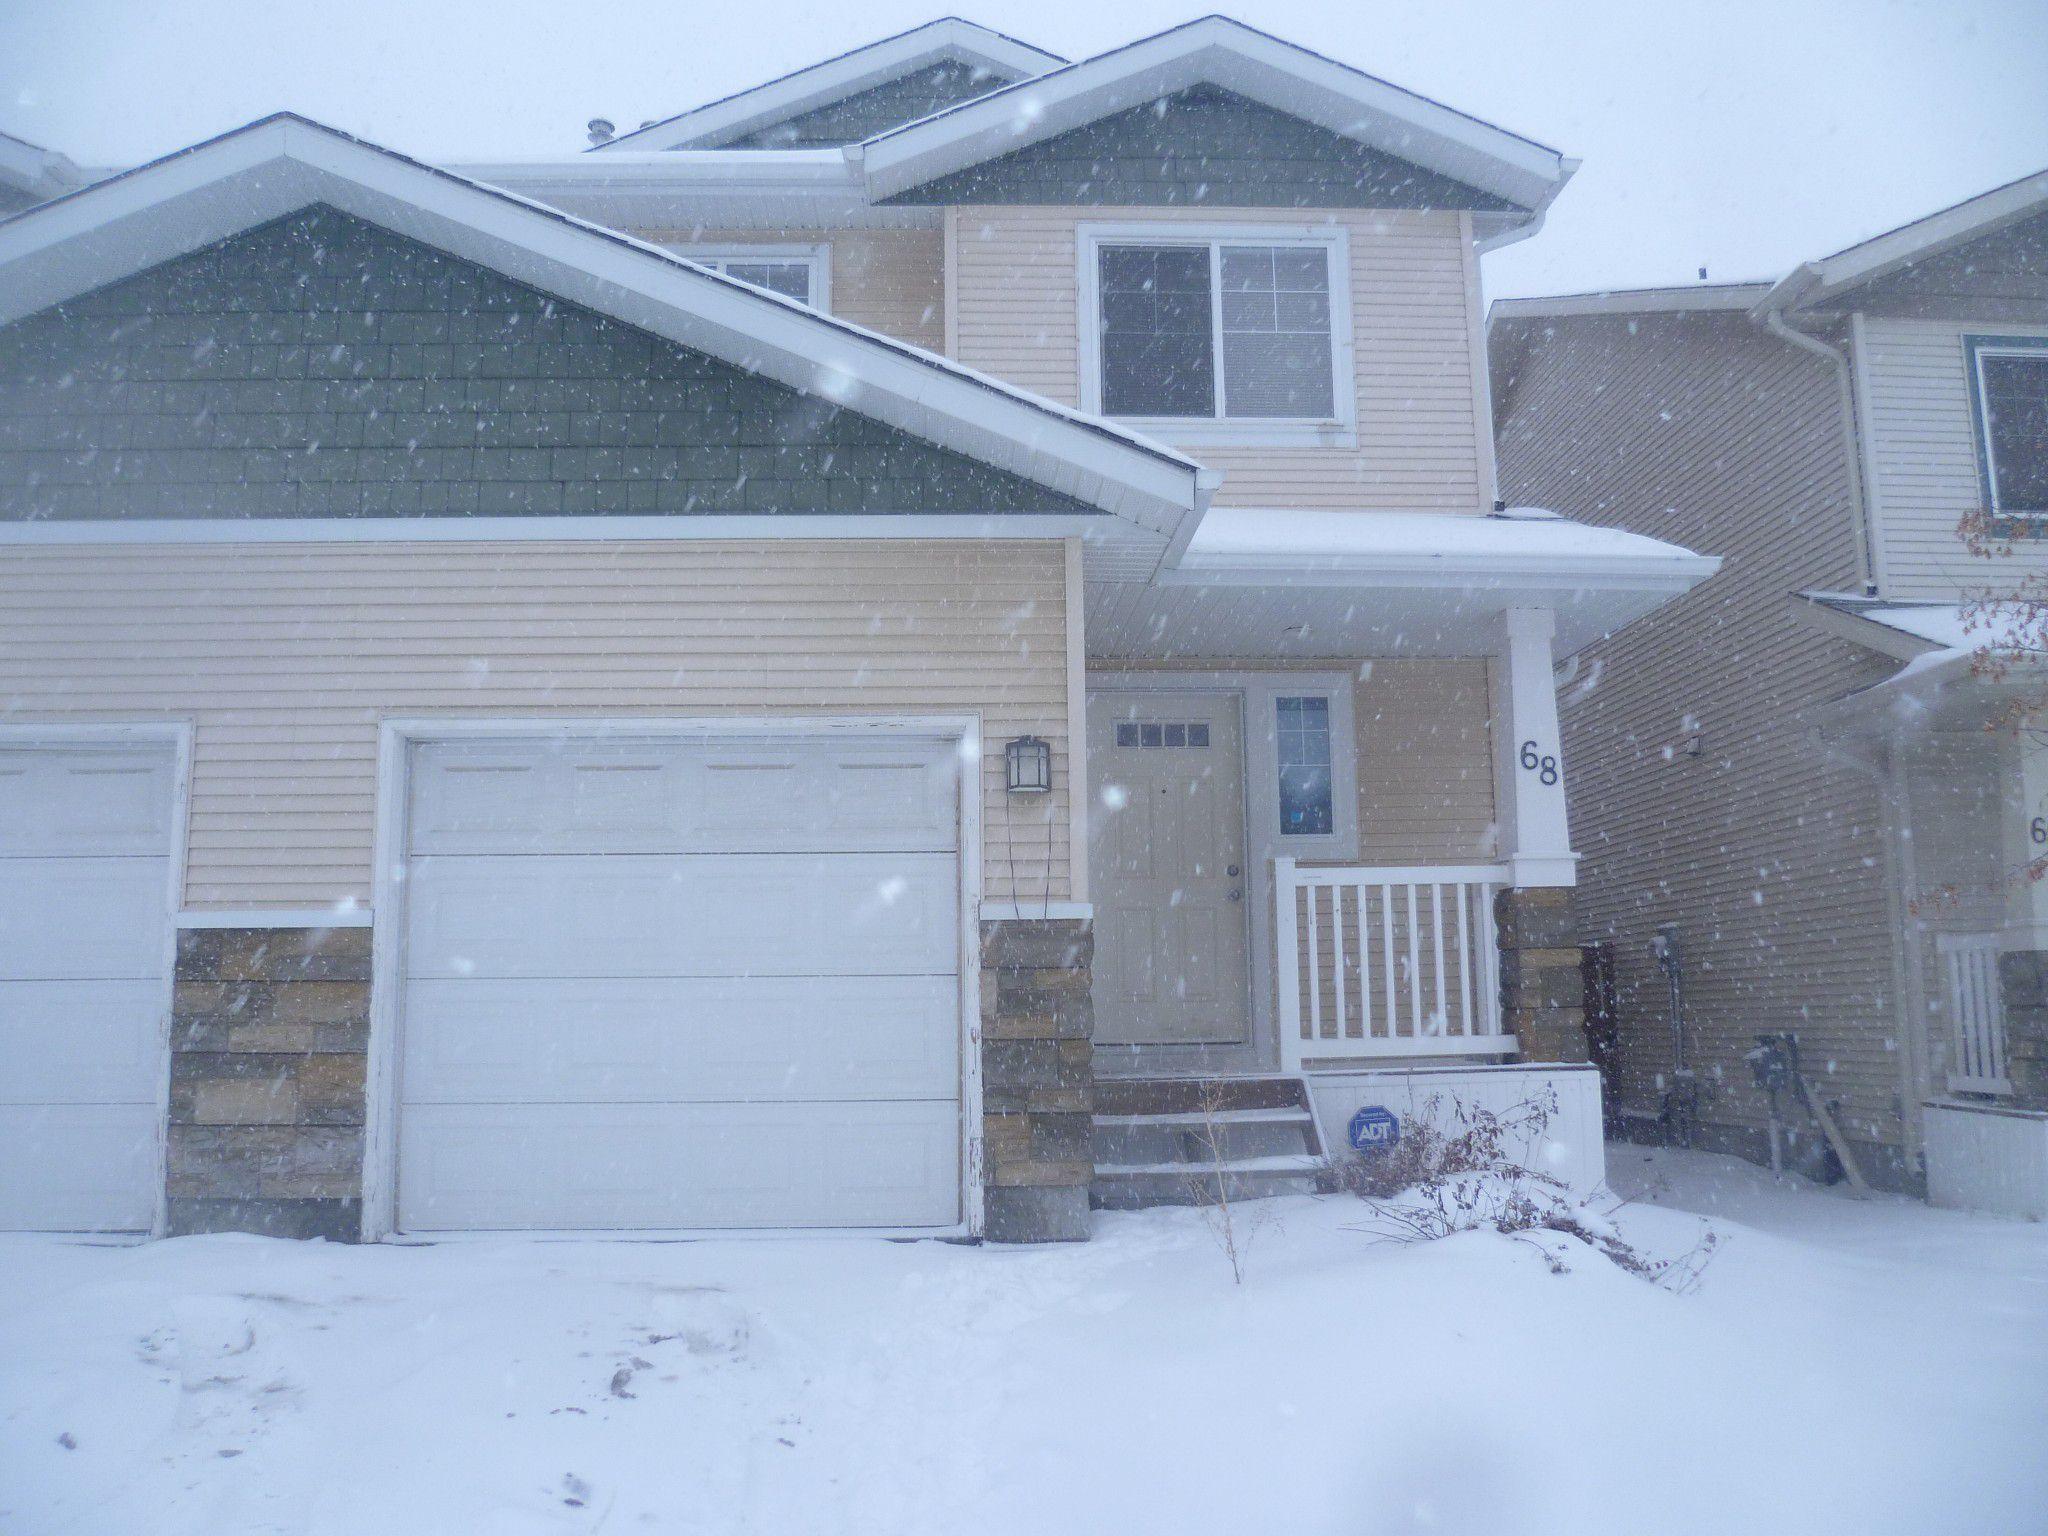 Main Photo: 68, 14208 - 36 Street in Edmonton: Townhouse for rent